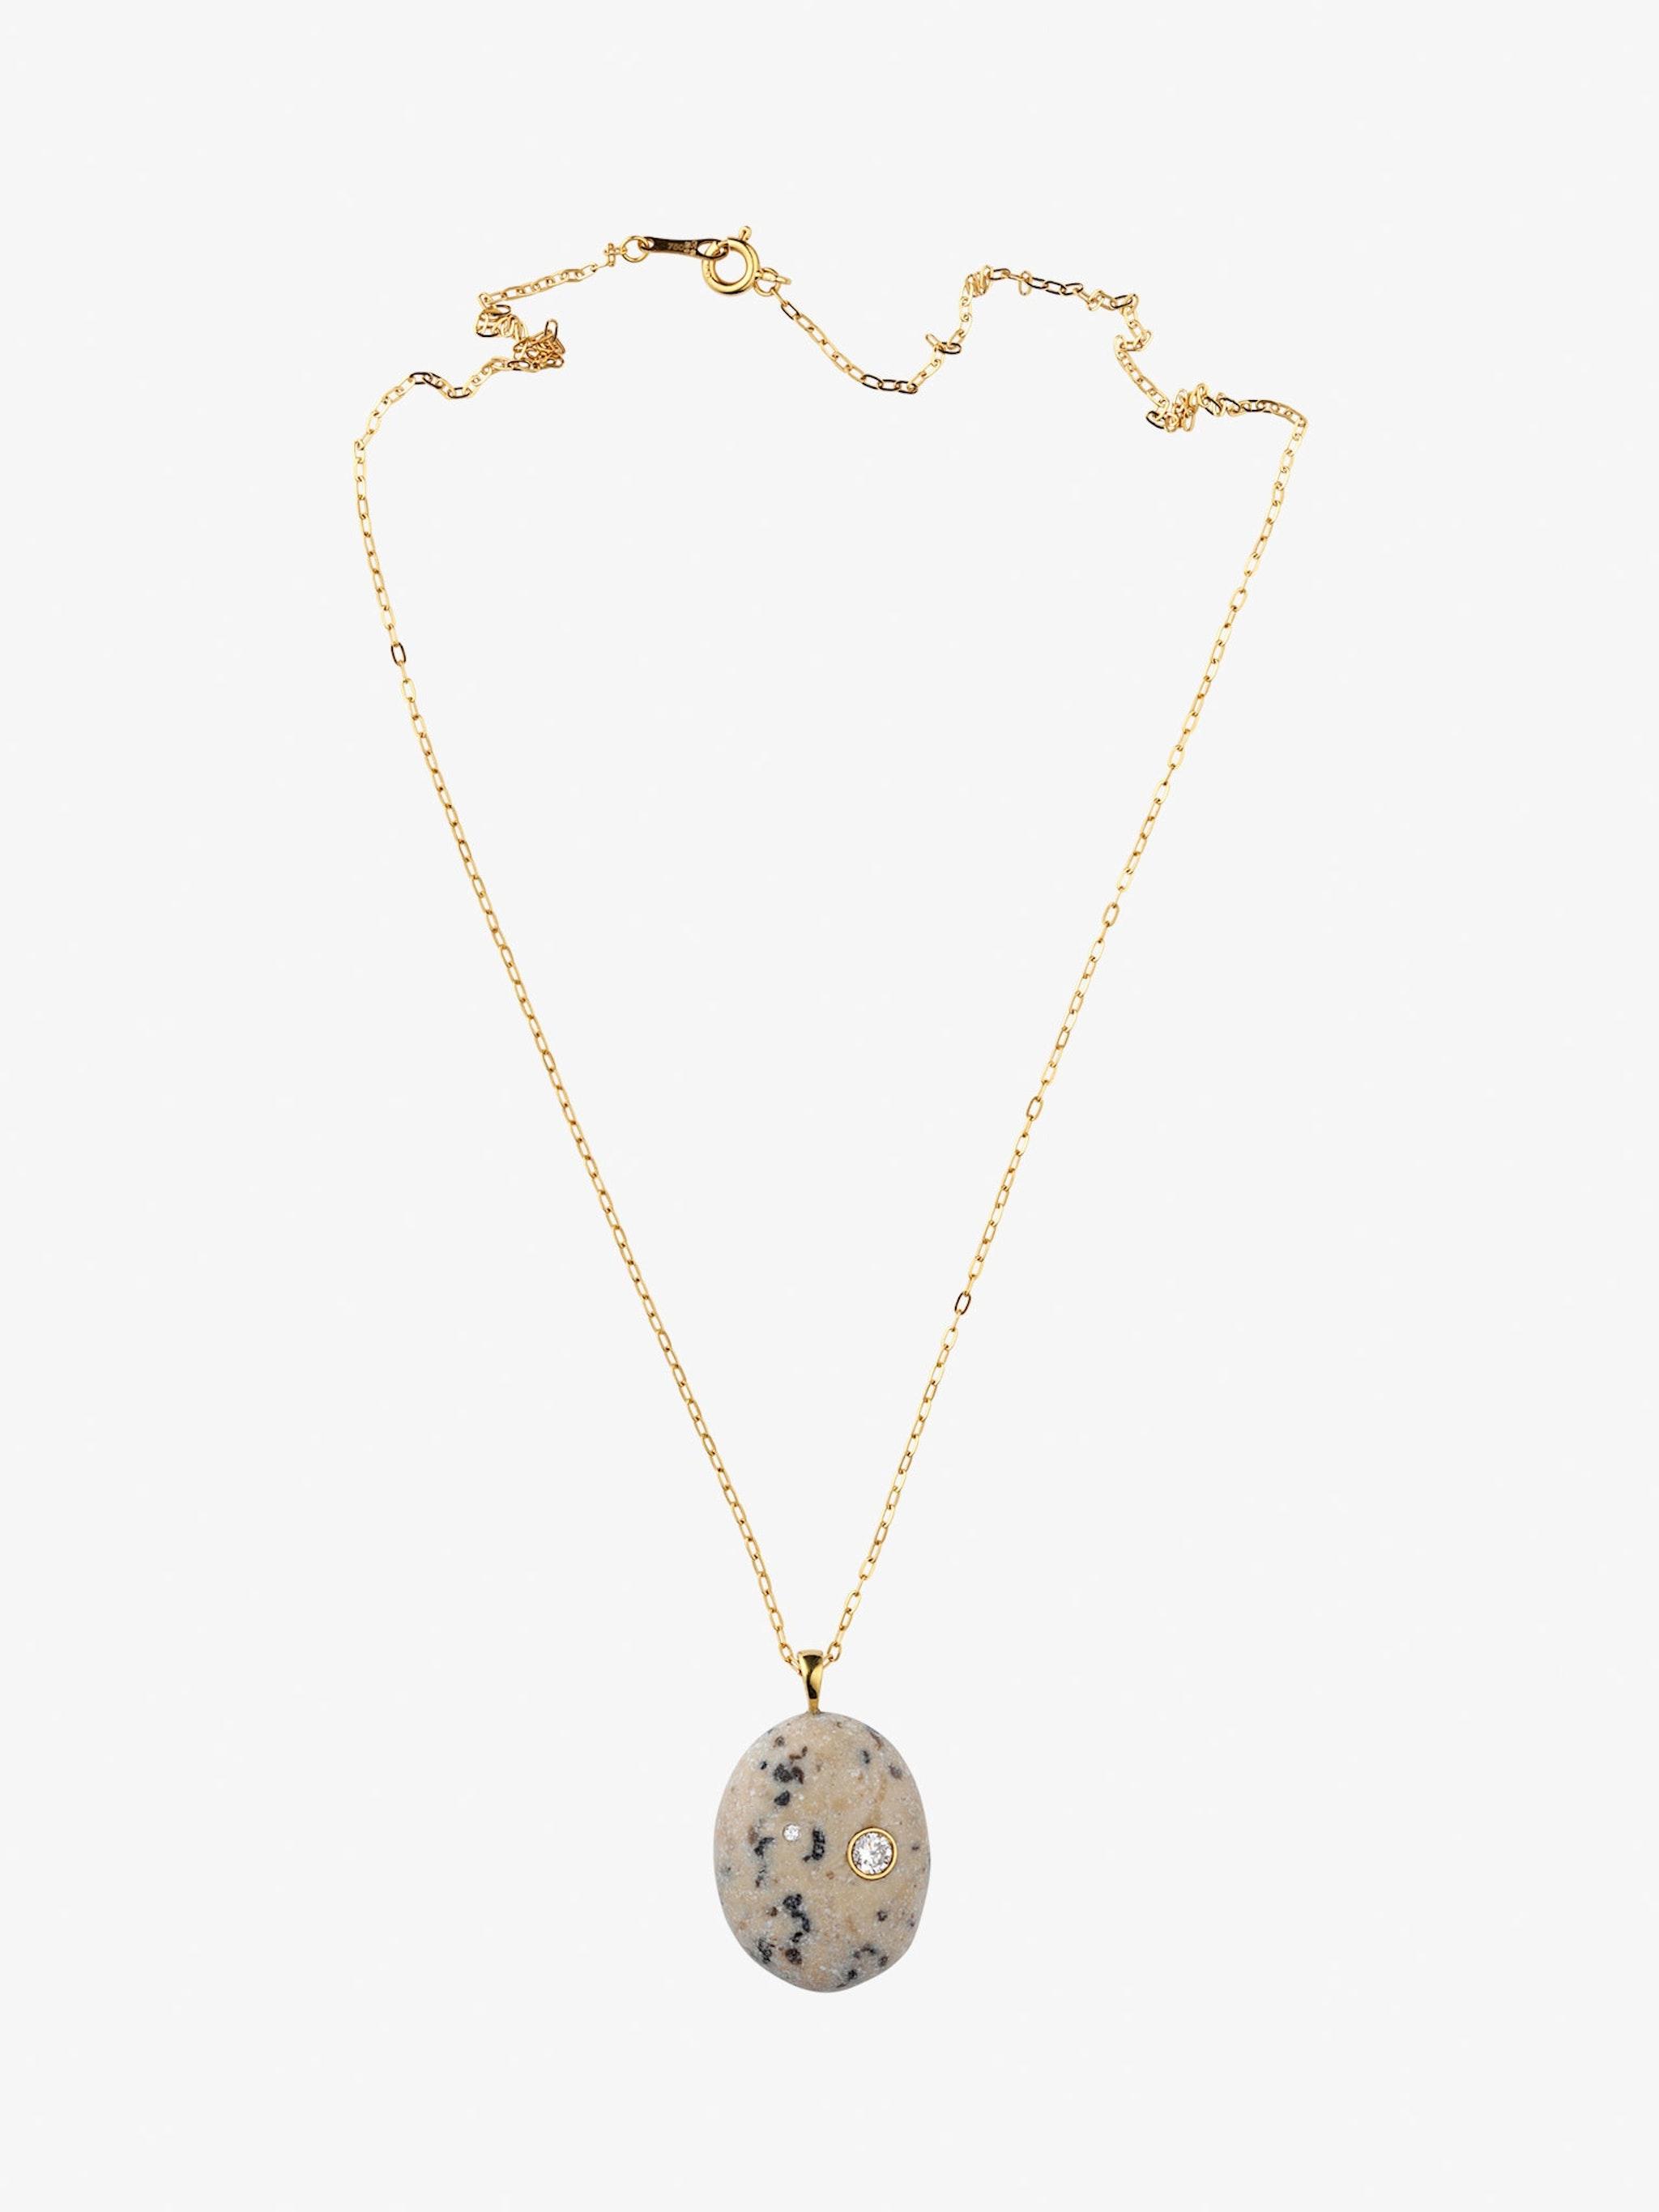 Sale e pepe gold, stone and diamond necklace photo 1